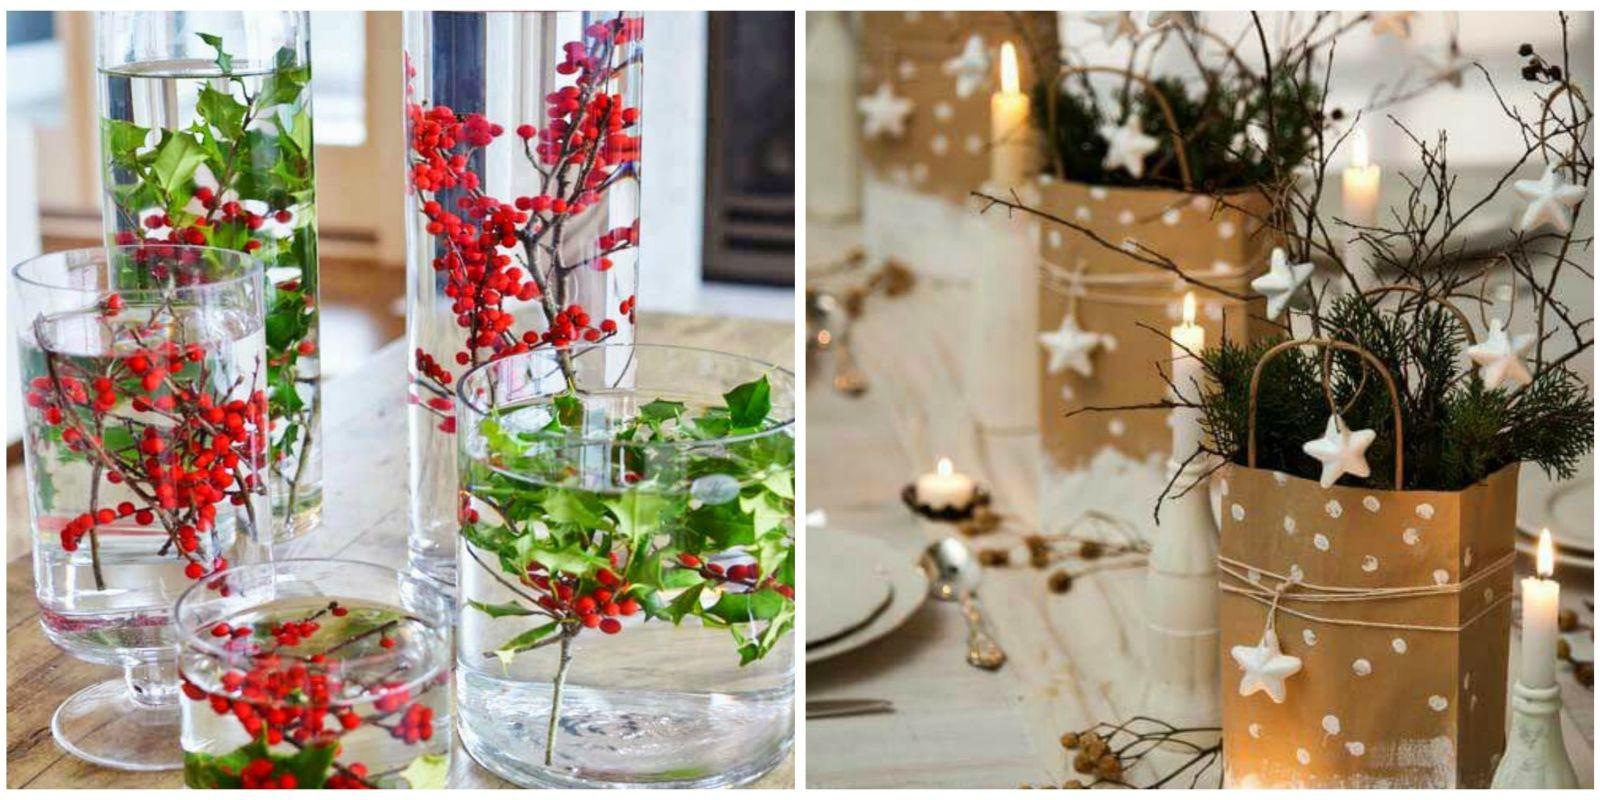 16 best diy christmas centerpieces beautiful ideas for Small christmas centerpieces